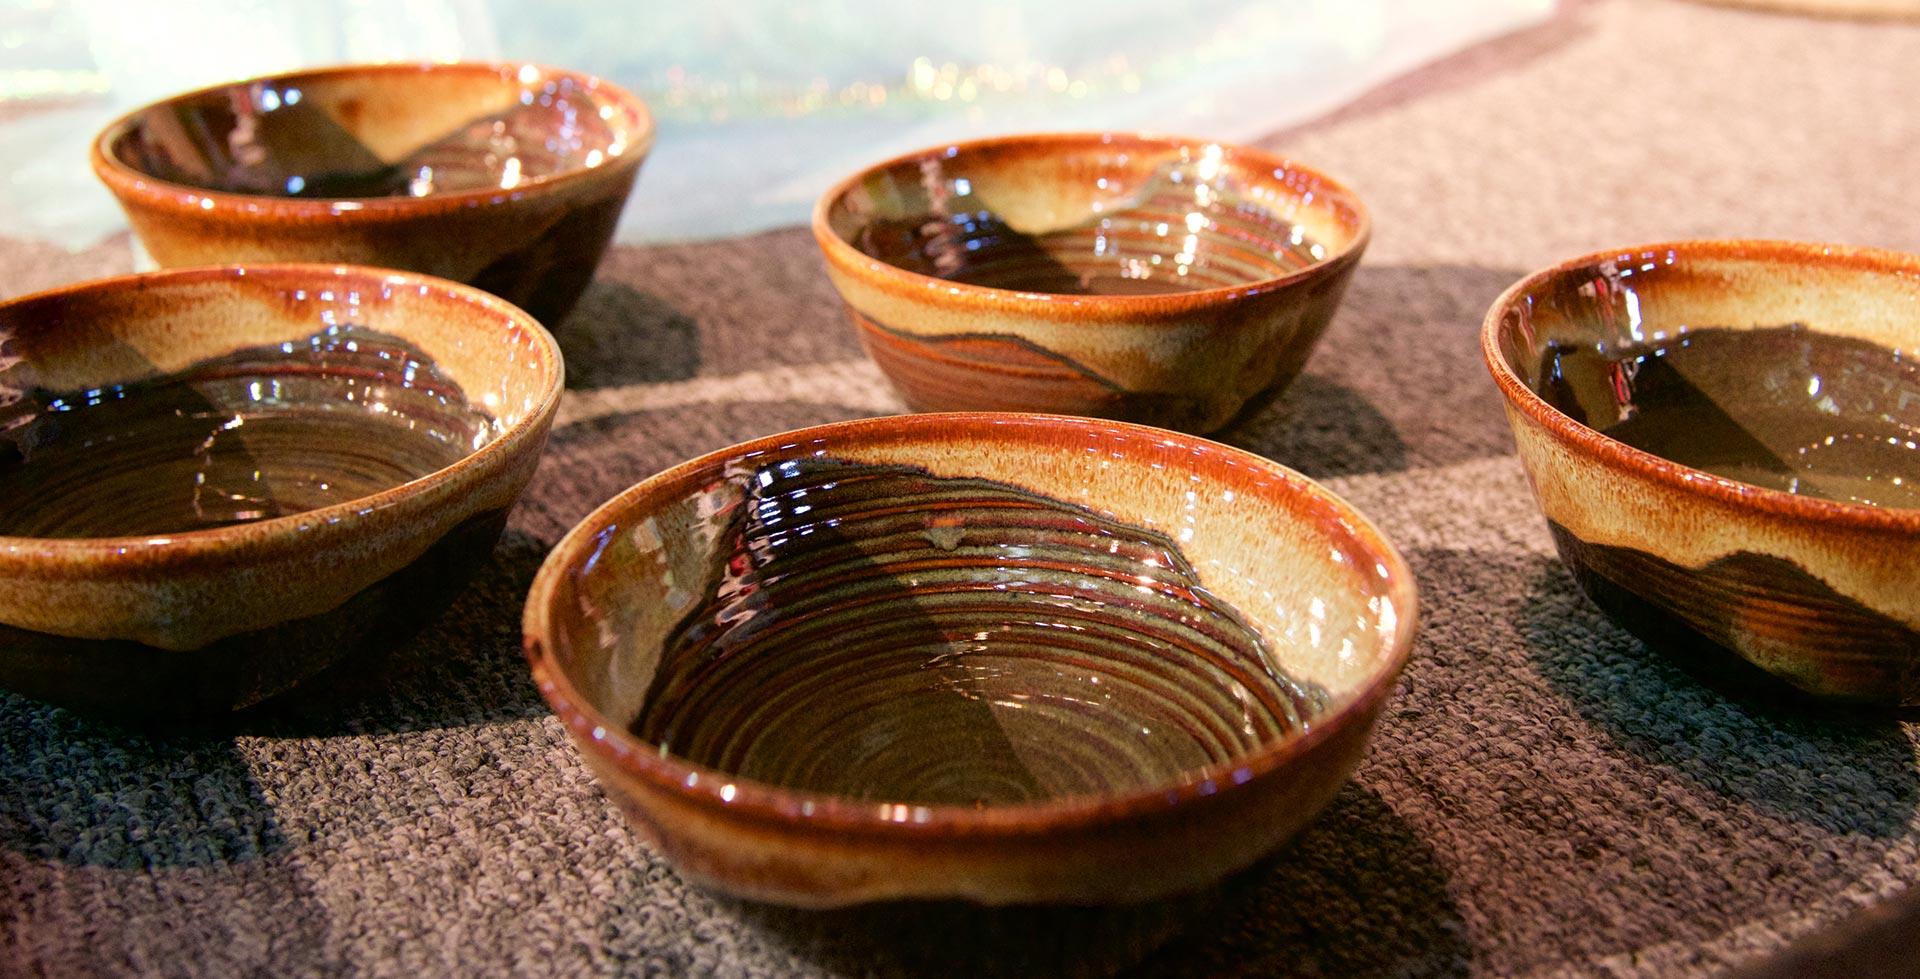 Five ceramic bowls